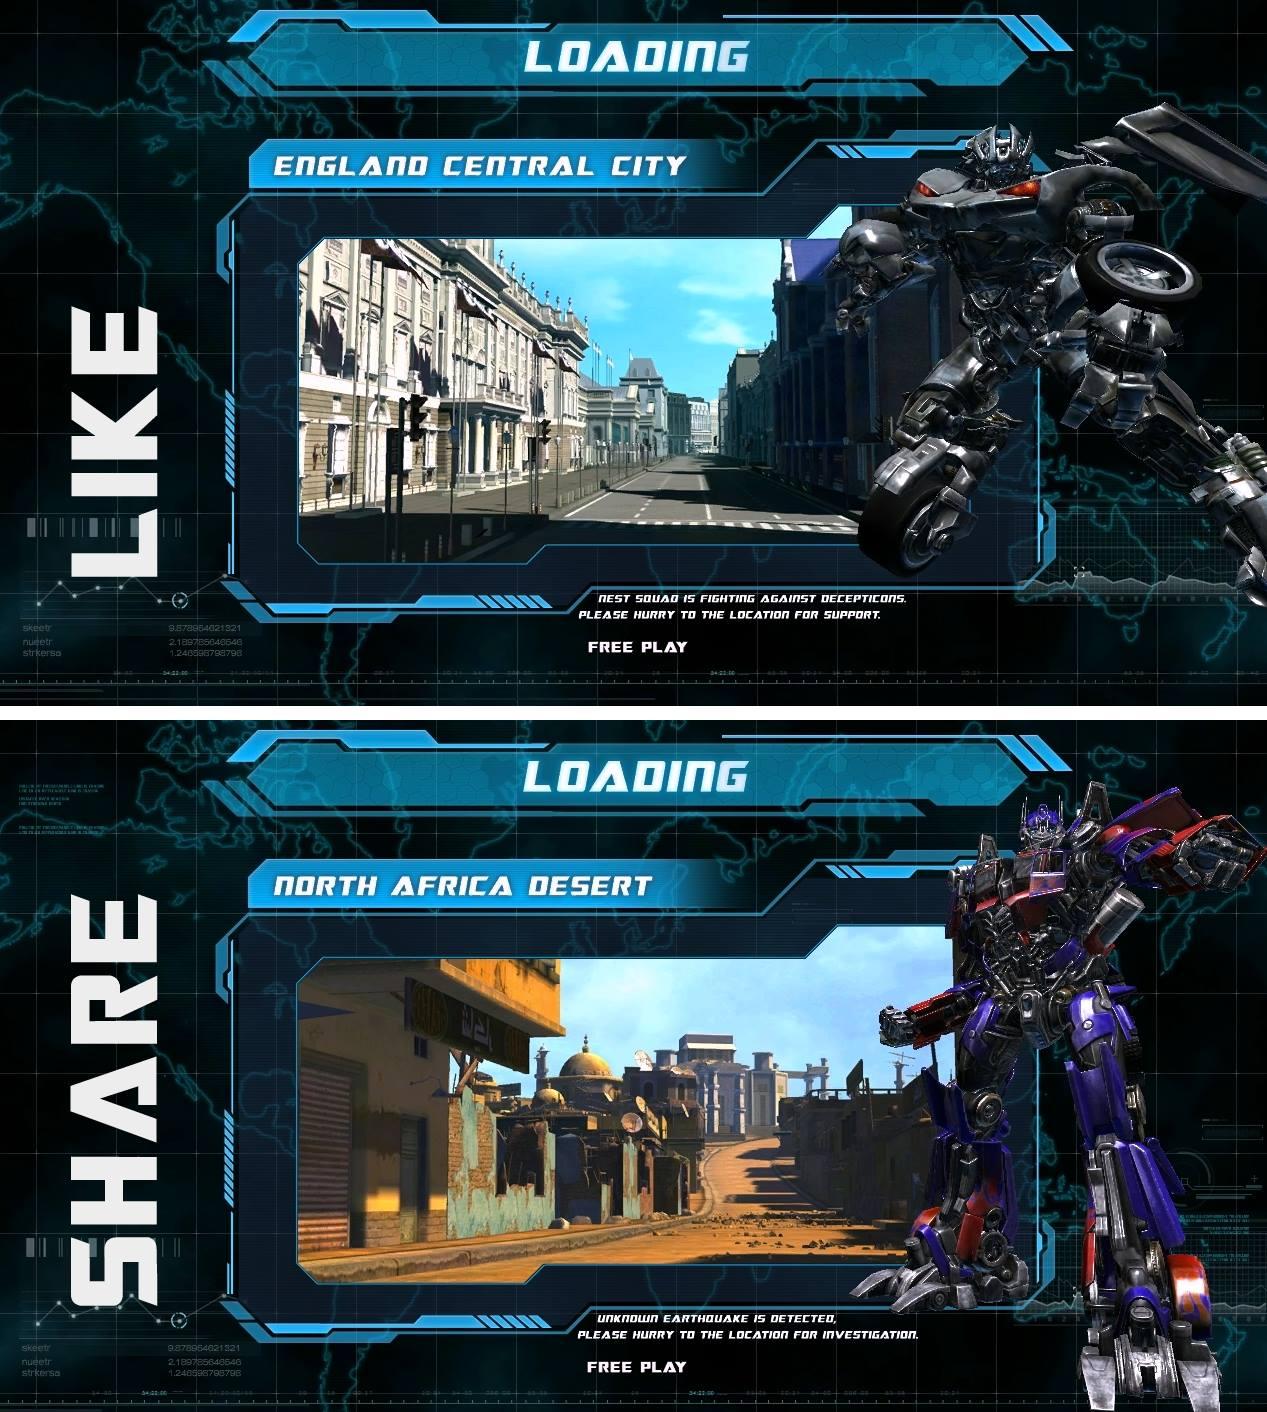 Sega-Transformers-Human-Alliance-Arcade-Game-Stage-Select_1380767225.jpg